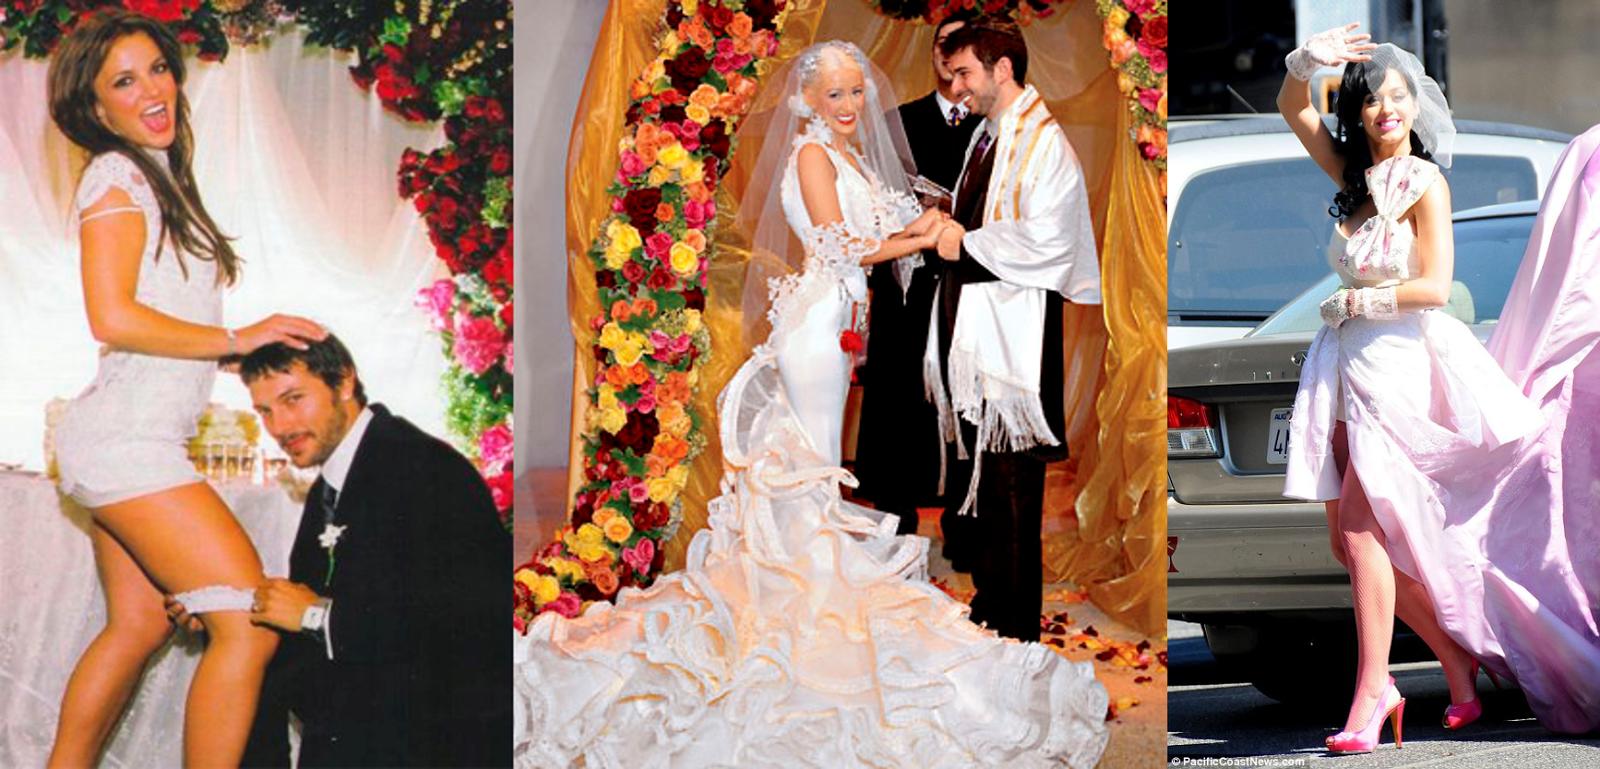 2428a20f8d78c Boda de britney spears boda de christina aguilera boda de kate perry  farruquito boda png 1600x769